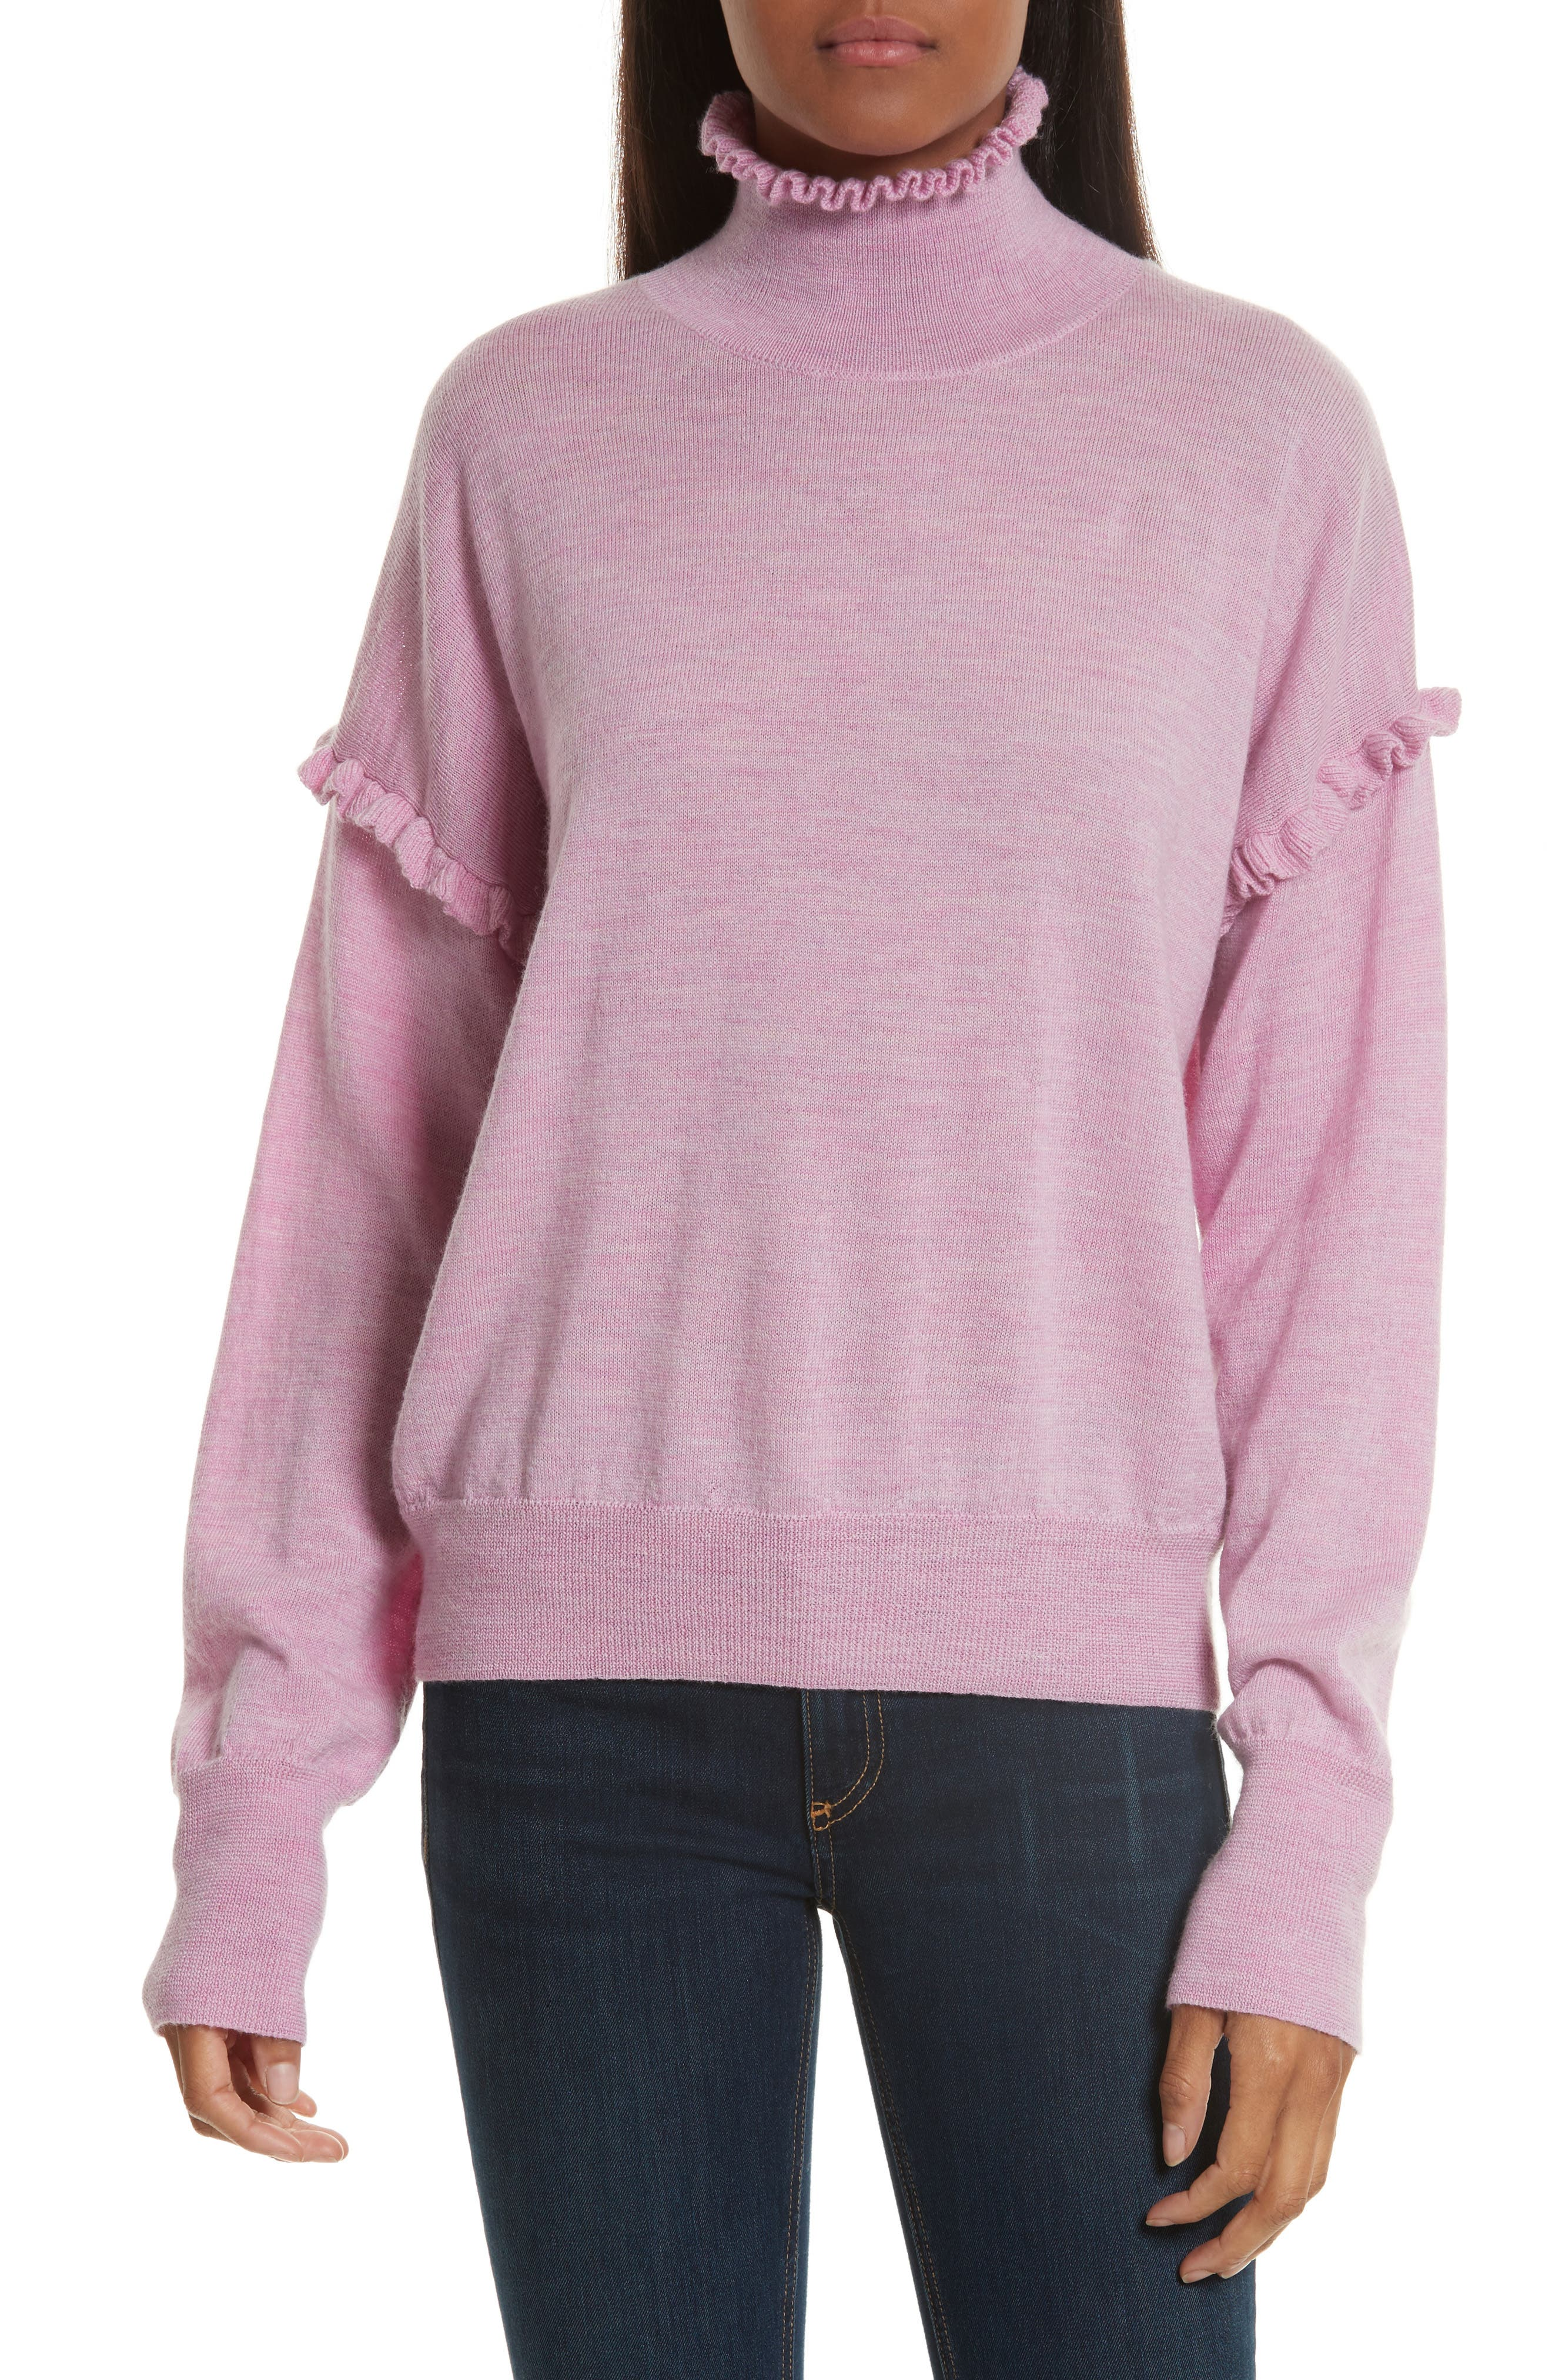 Turtleneck Merino Wool Sweater,                             Main thumbnail 1, color,                             691